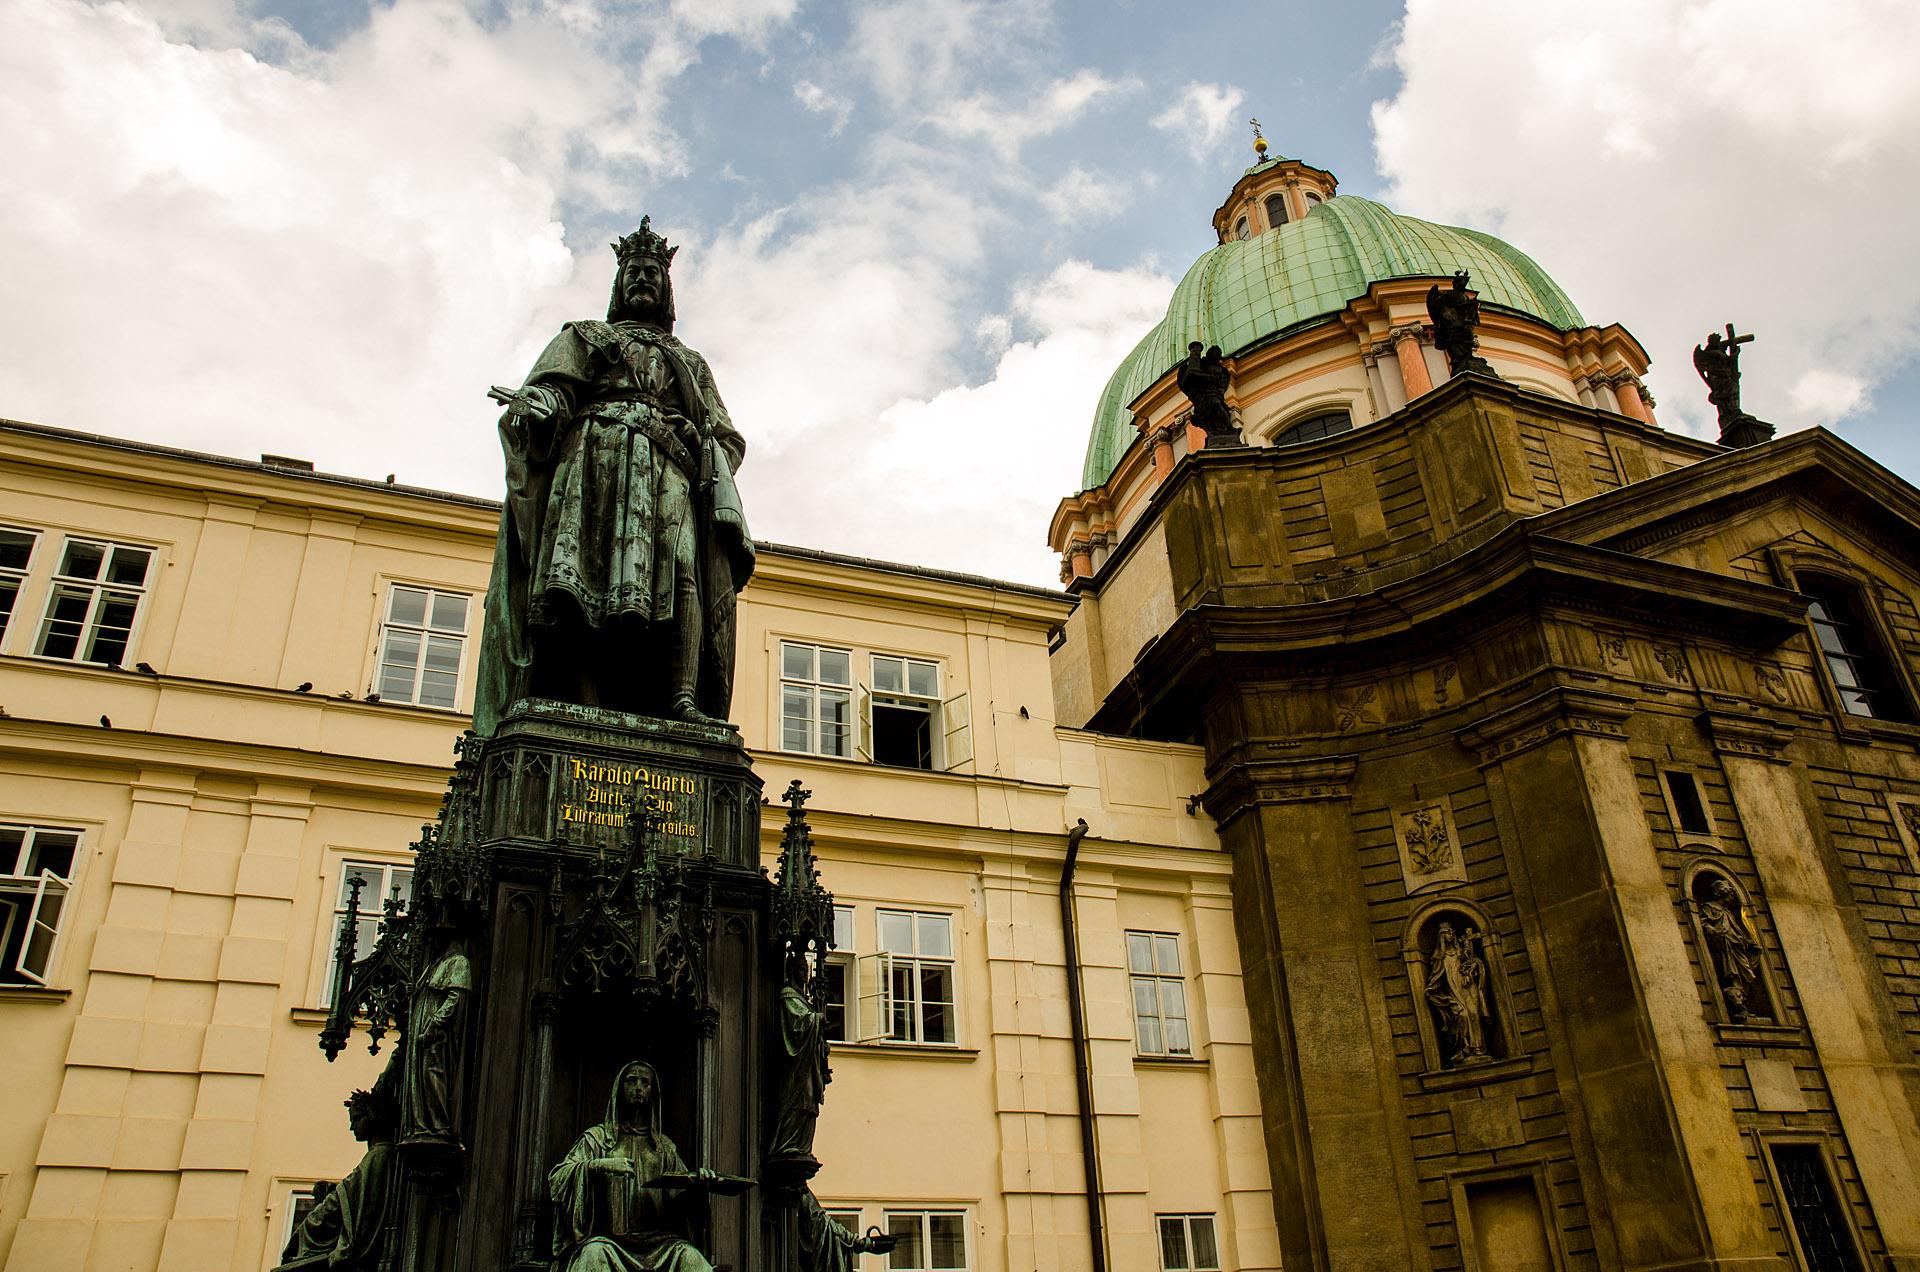 Charles IV Monument